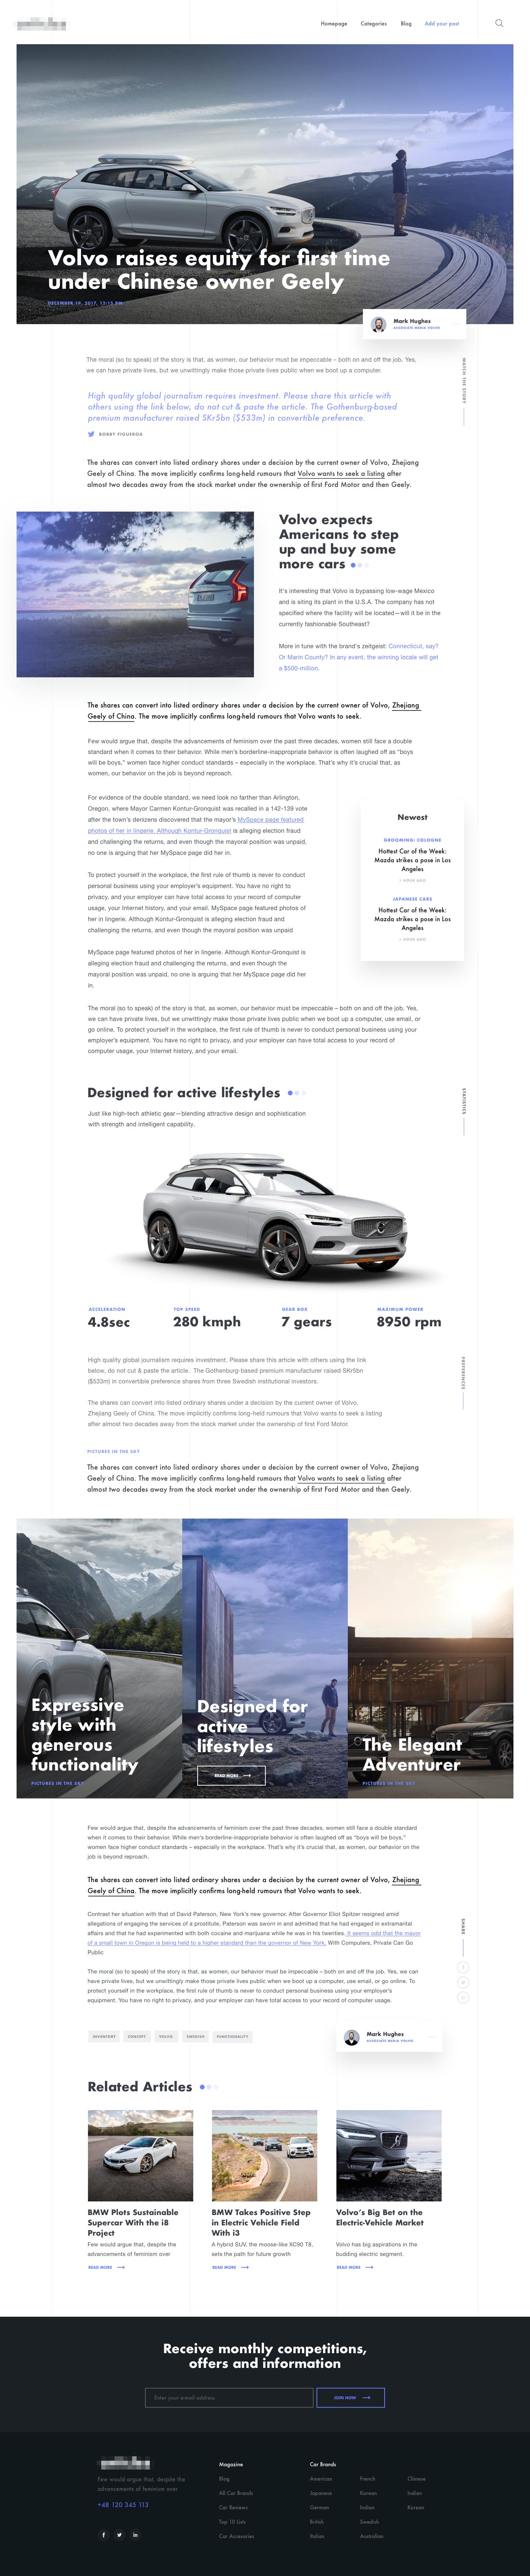 Volvo article